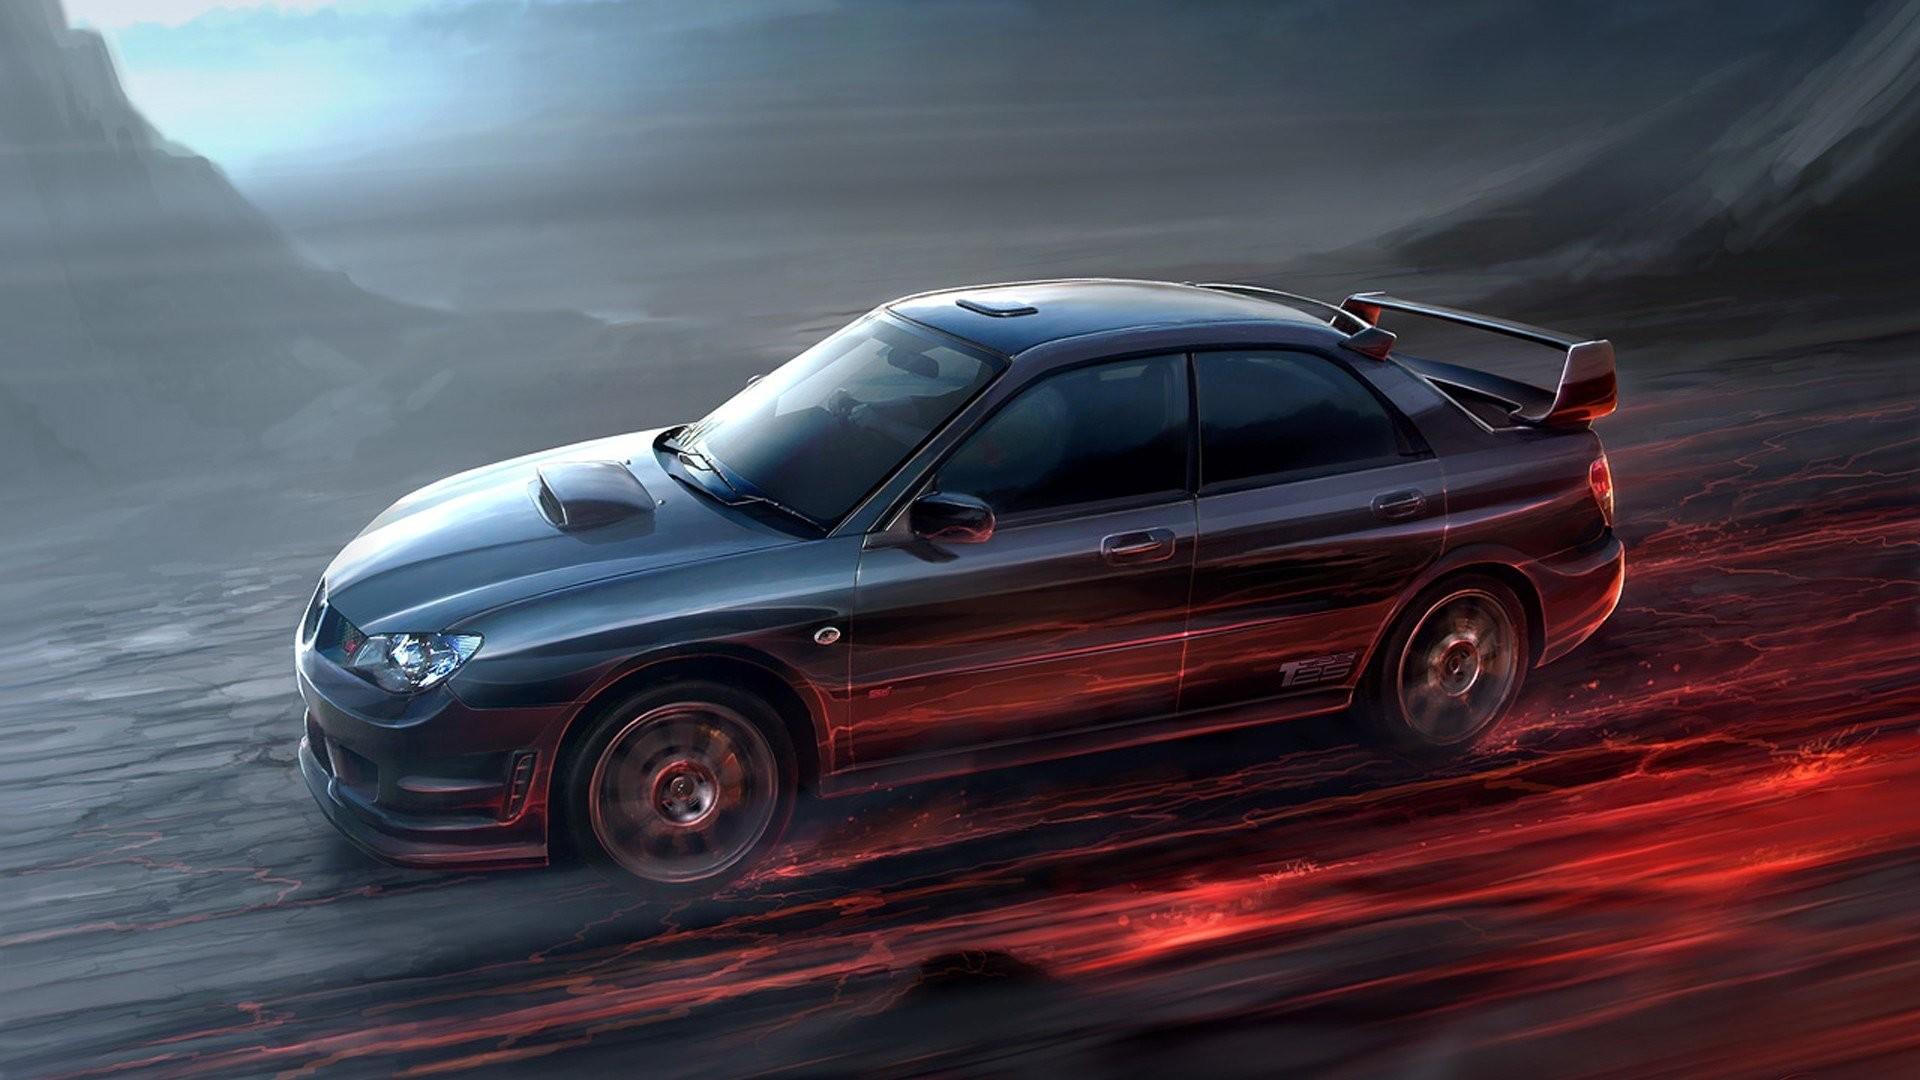 Artwork Cars Digital Art Flame Gary Tonge Subaru Impreza WRX STI